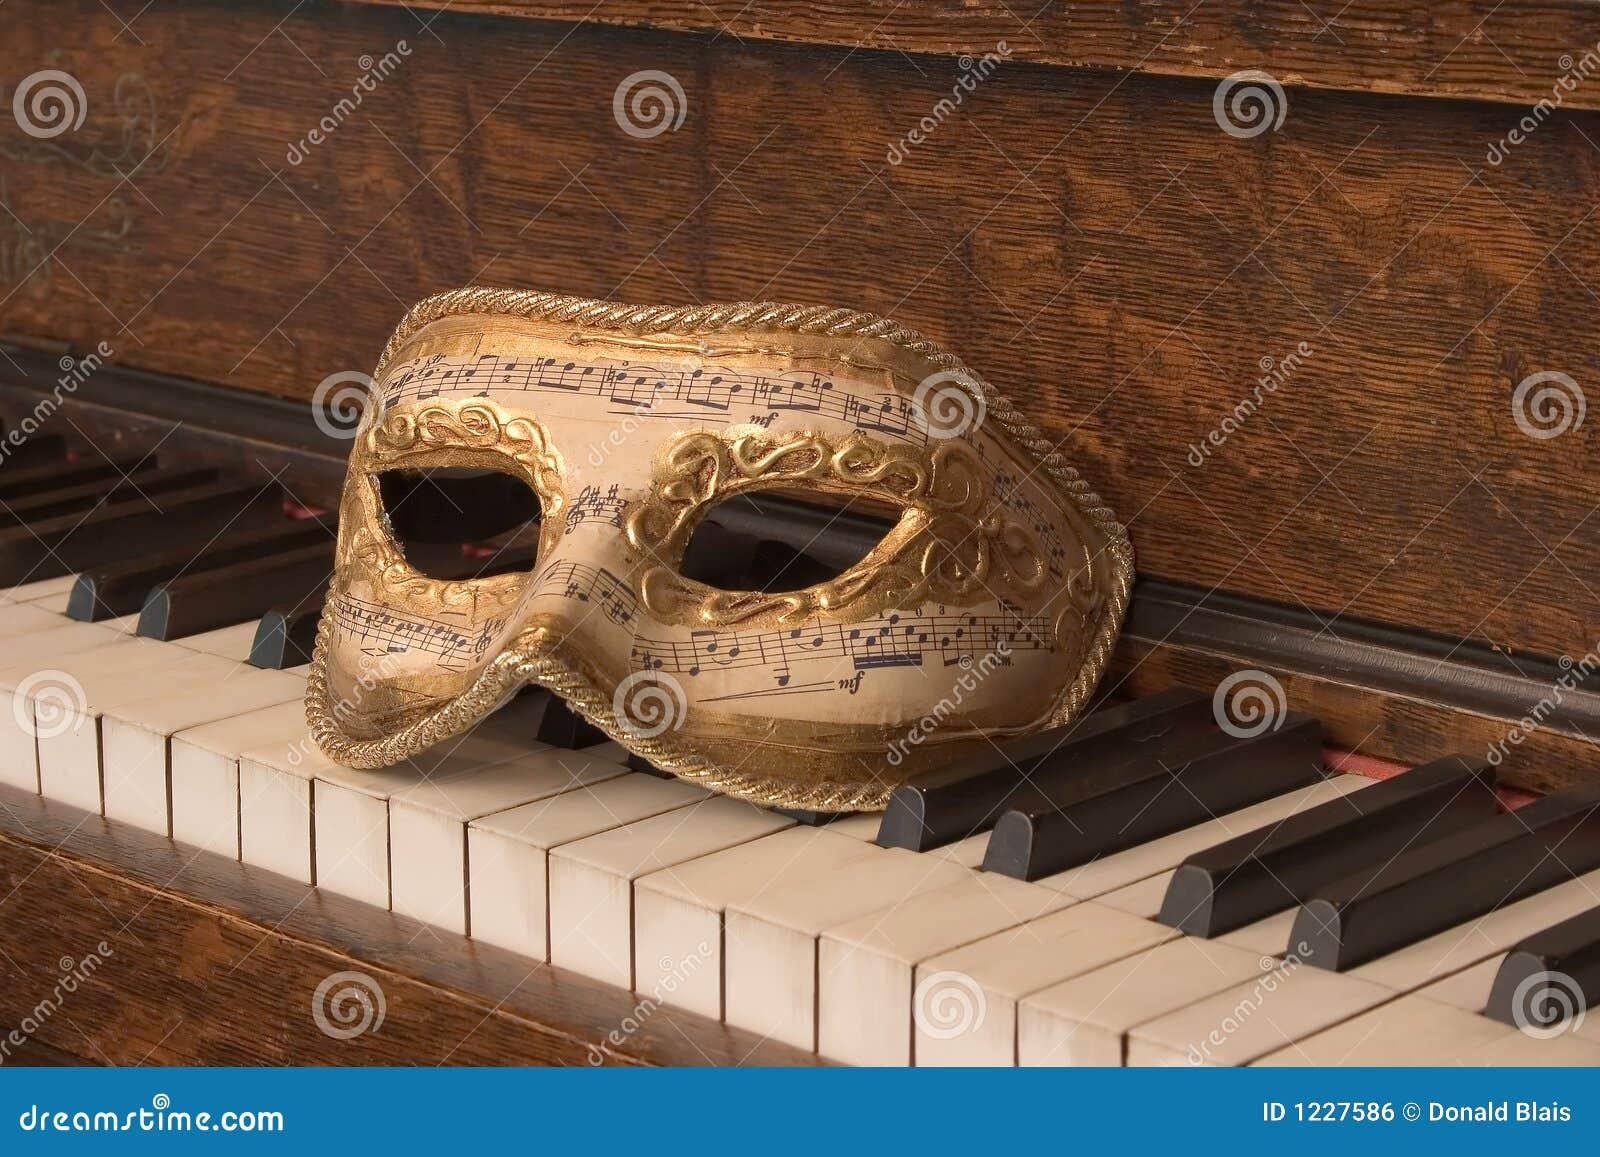 Piano_8095-1S droit